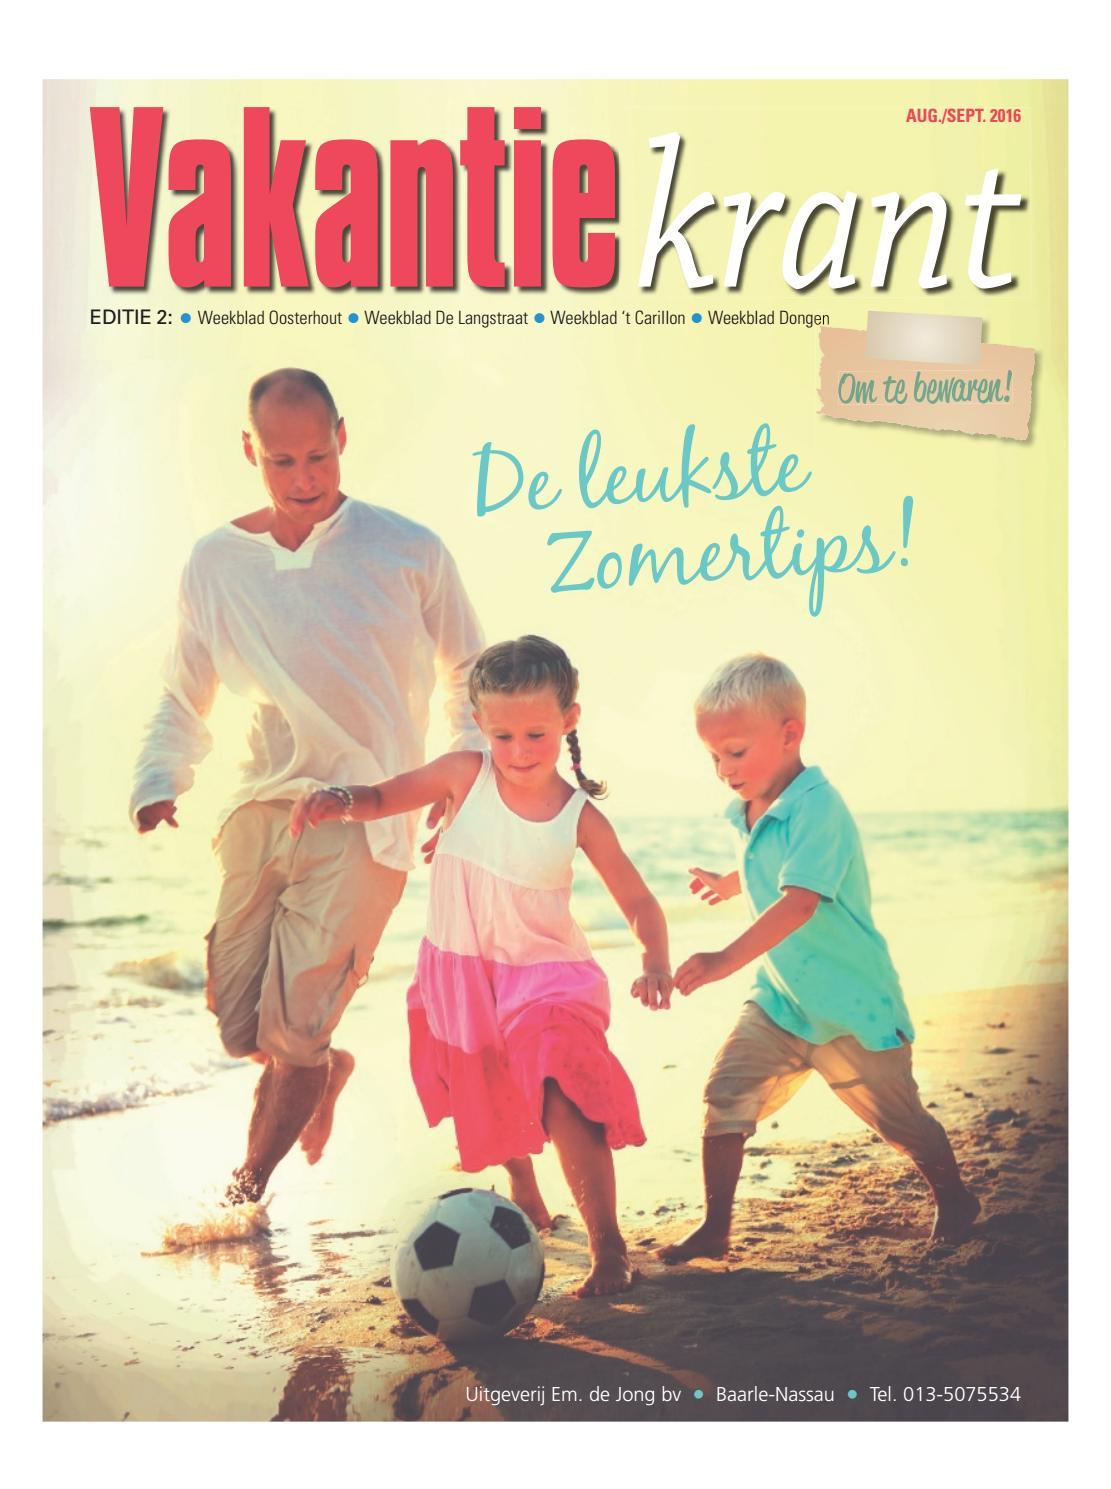 Vakantiekrant ed 2 03 08 2016 by uitgeverij em de jong for Nassau indus deur bv oosterhout